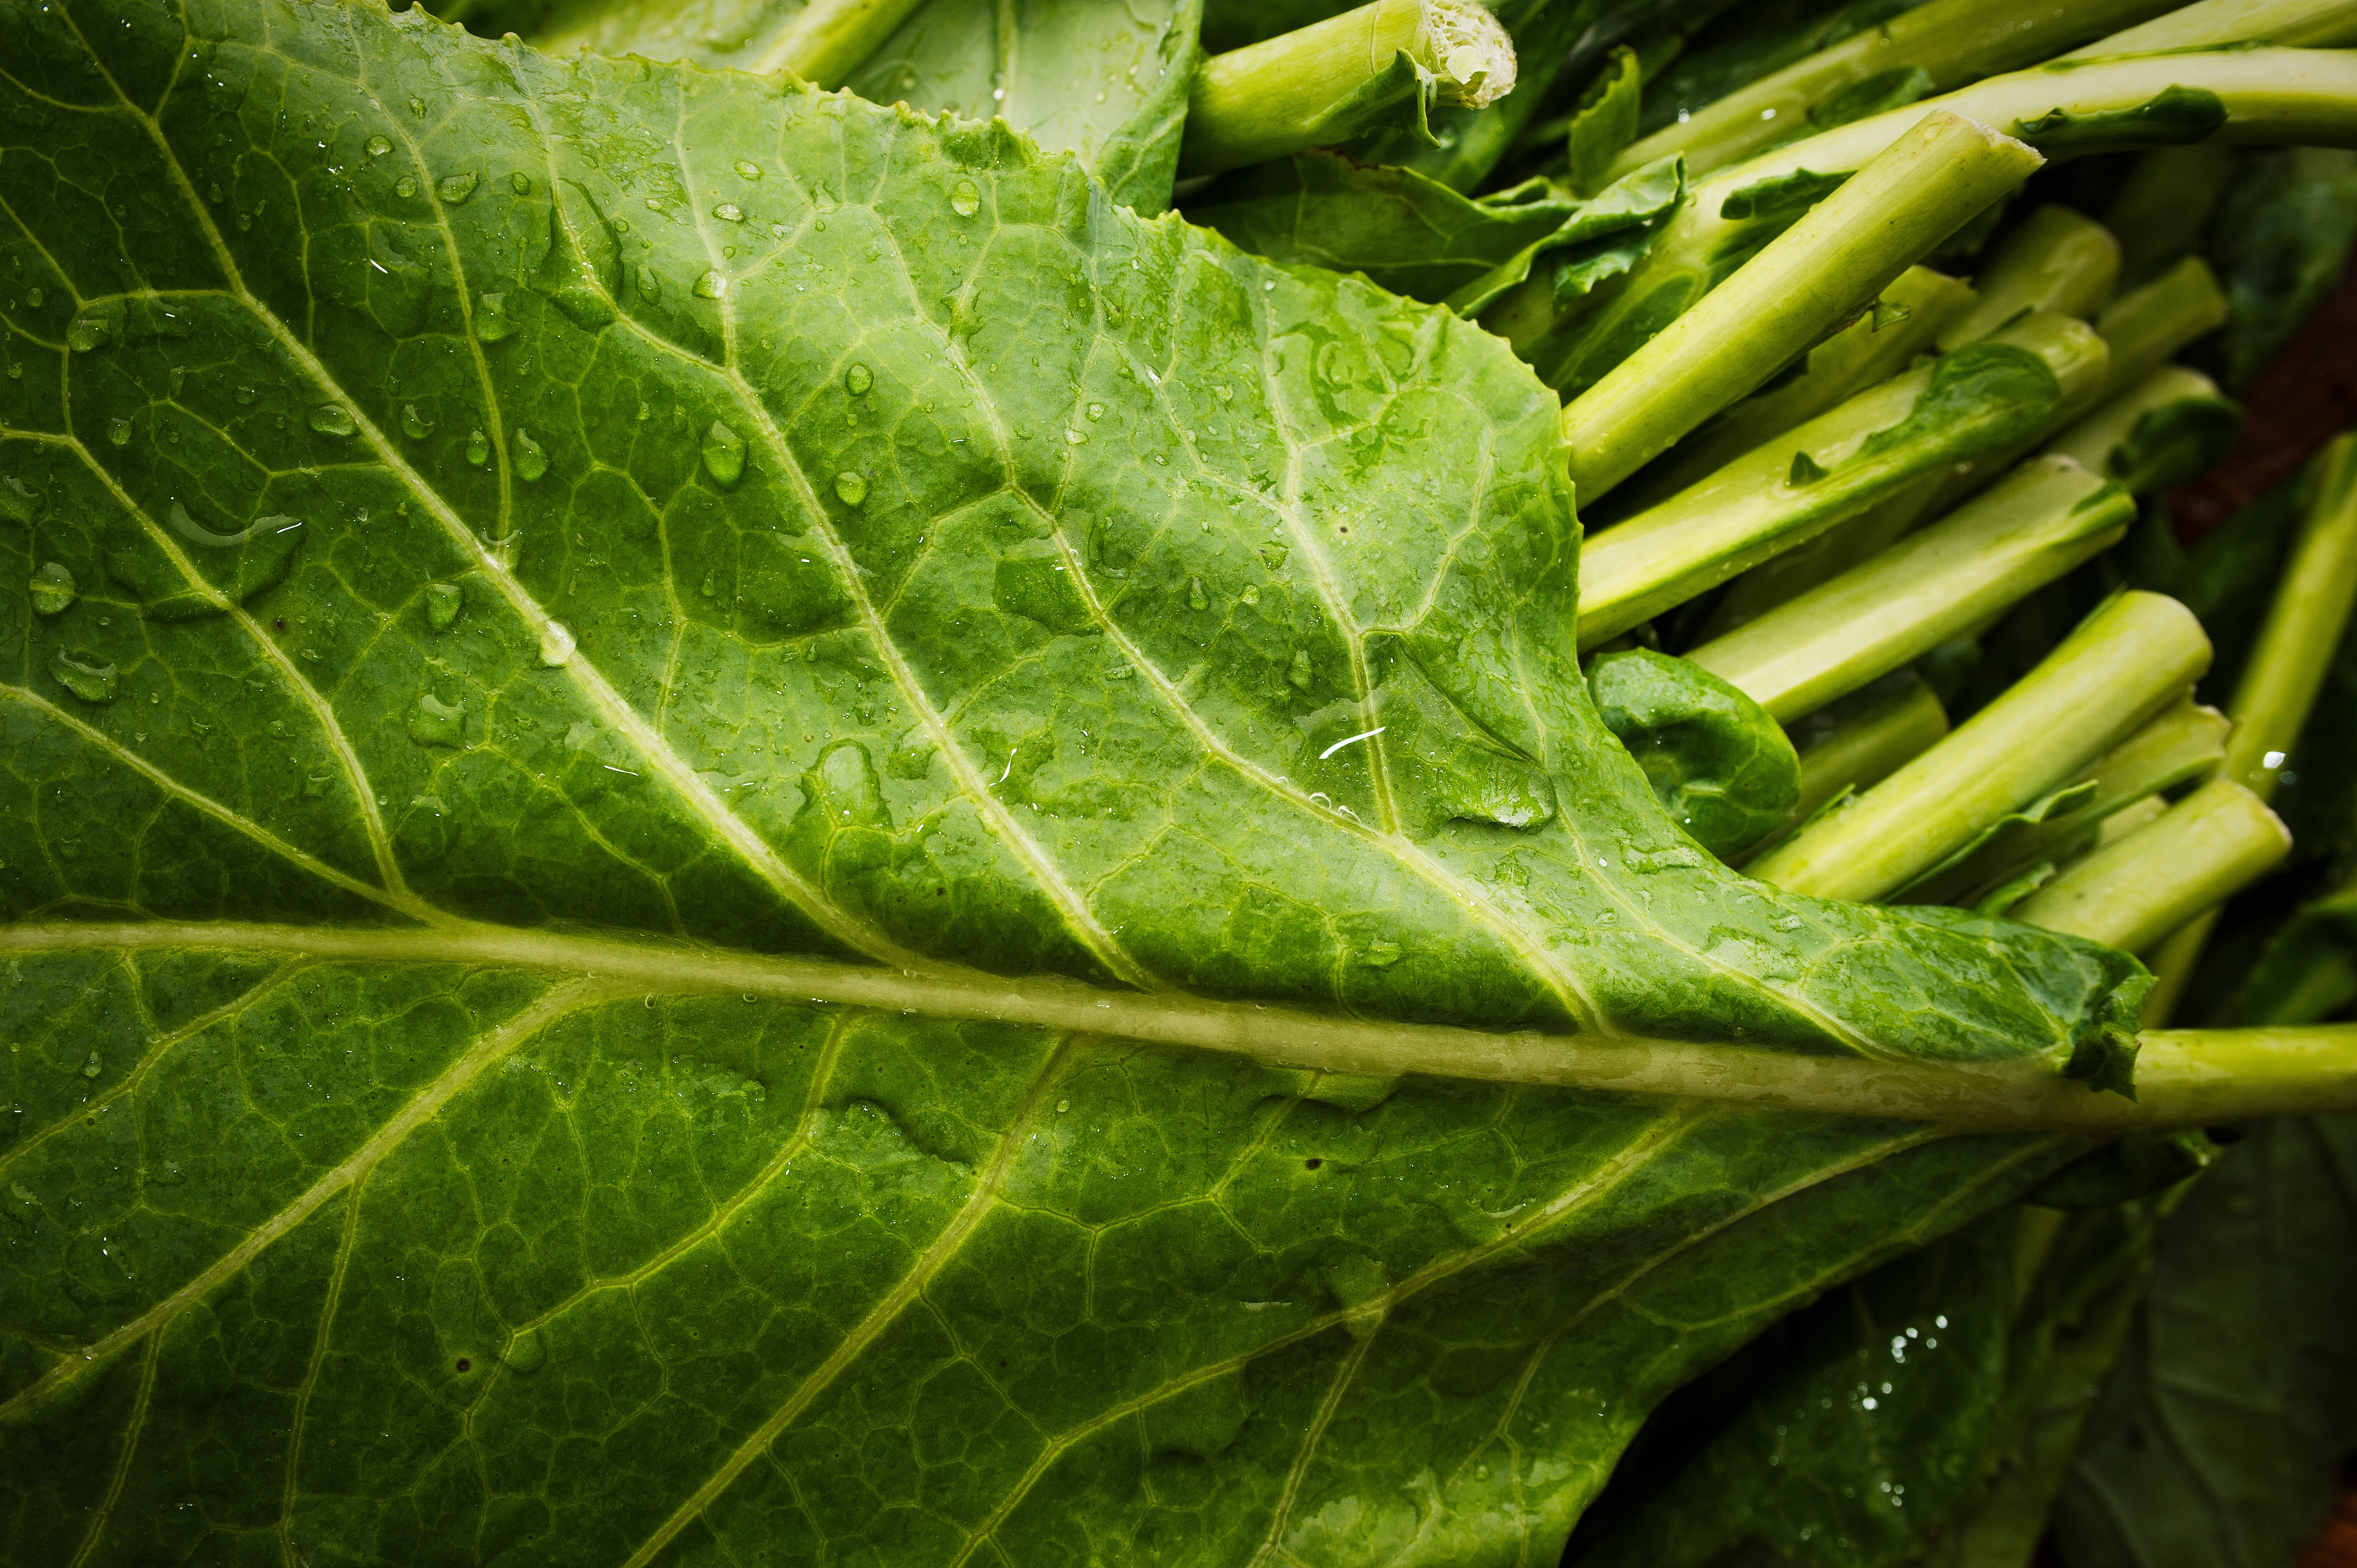 Boston Organics - Collards